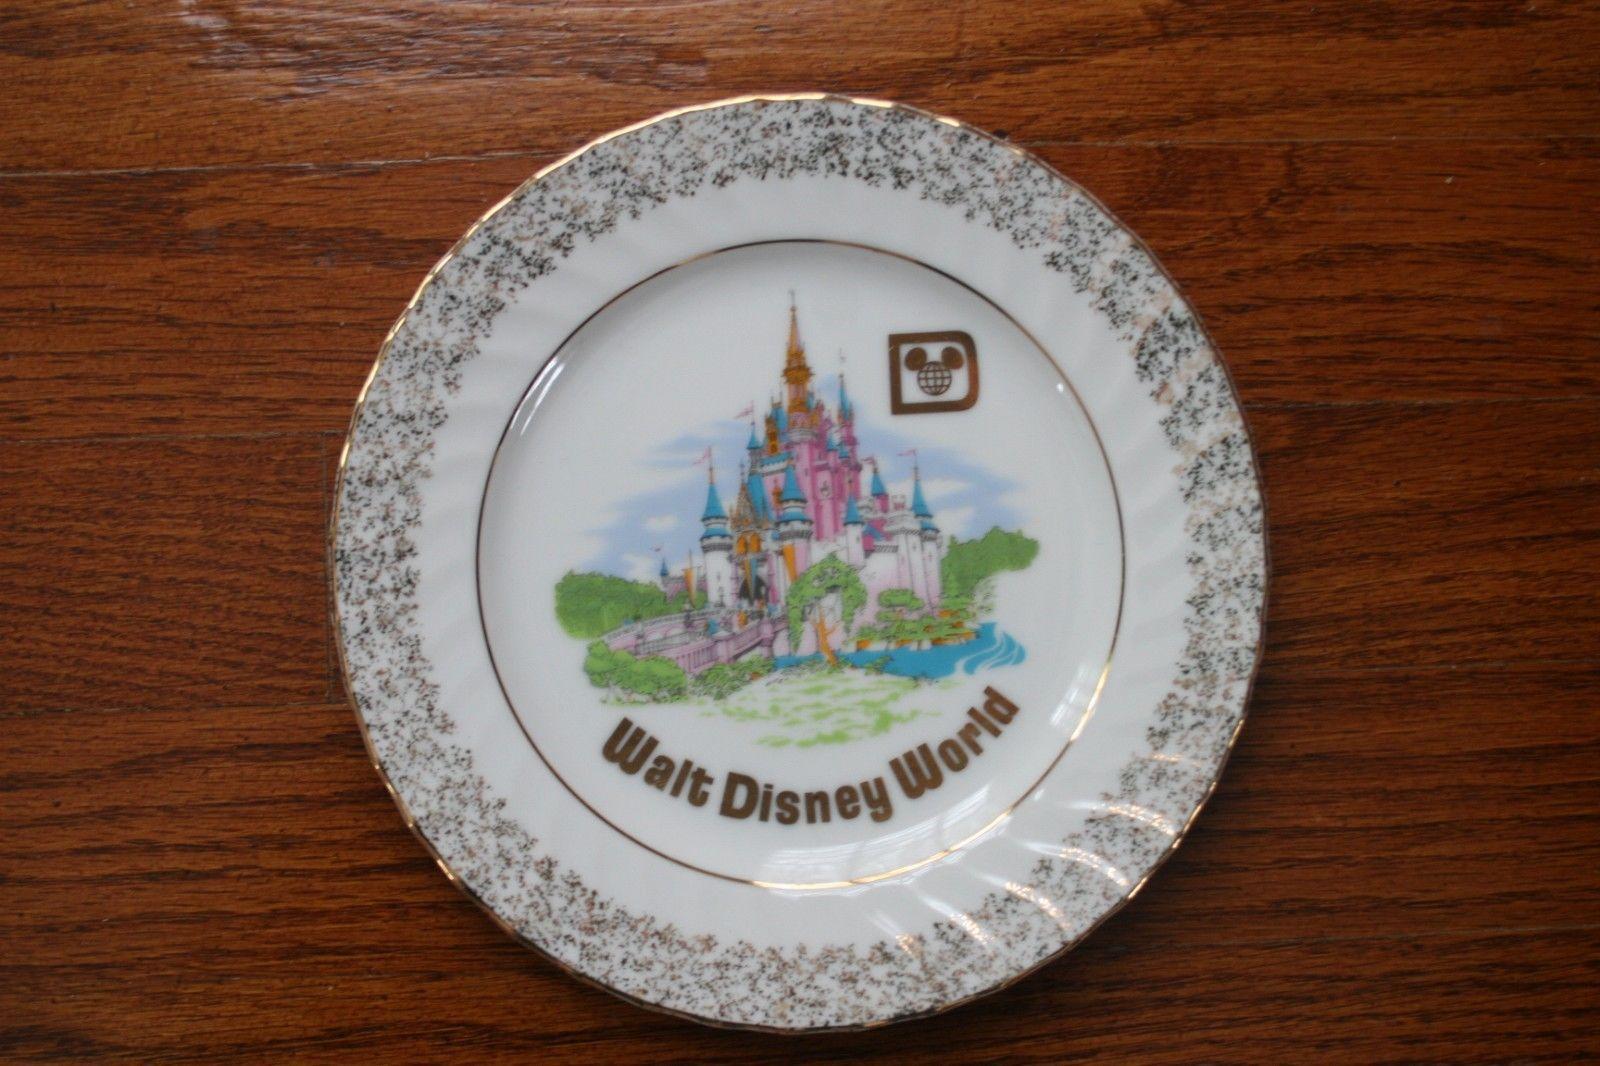 Vintage Walt Disney World Souvenir Plate Cinderella's Castle Made in Japan 7 1/2